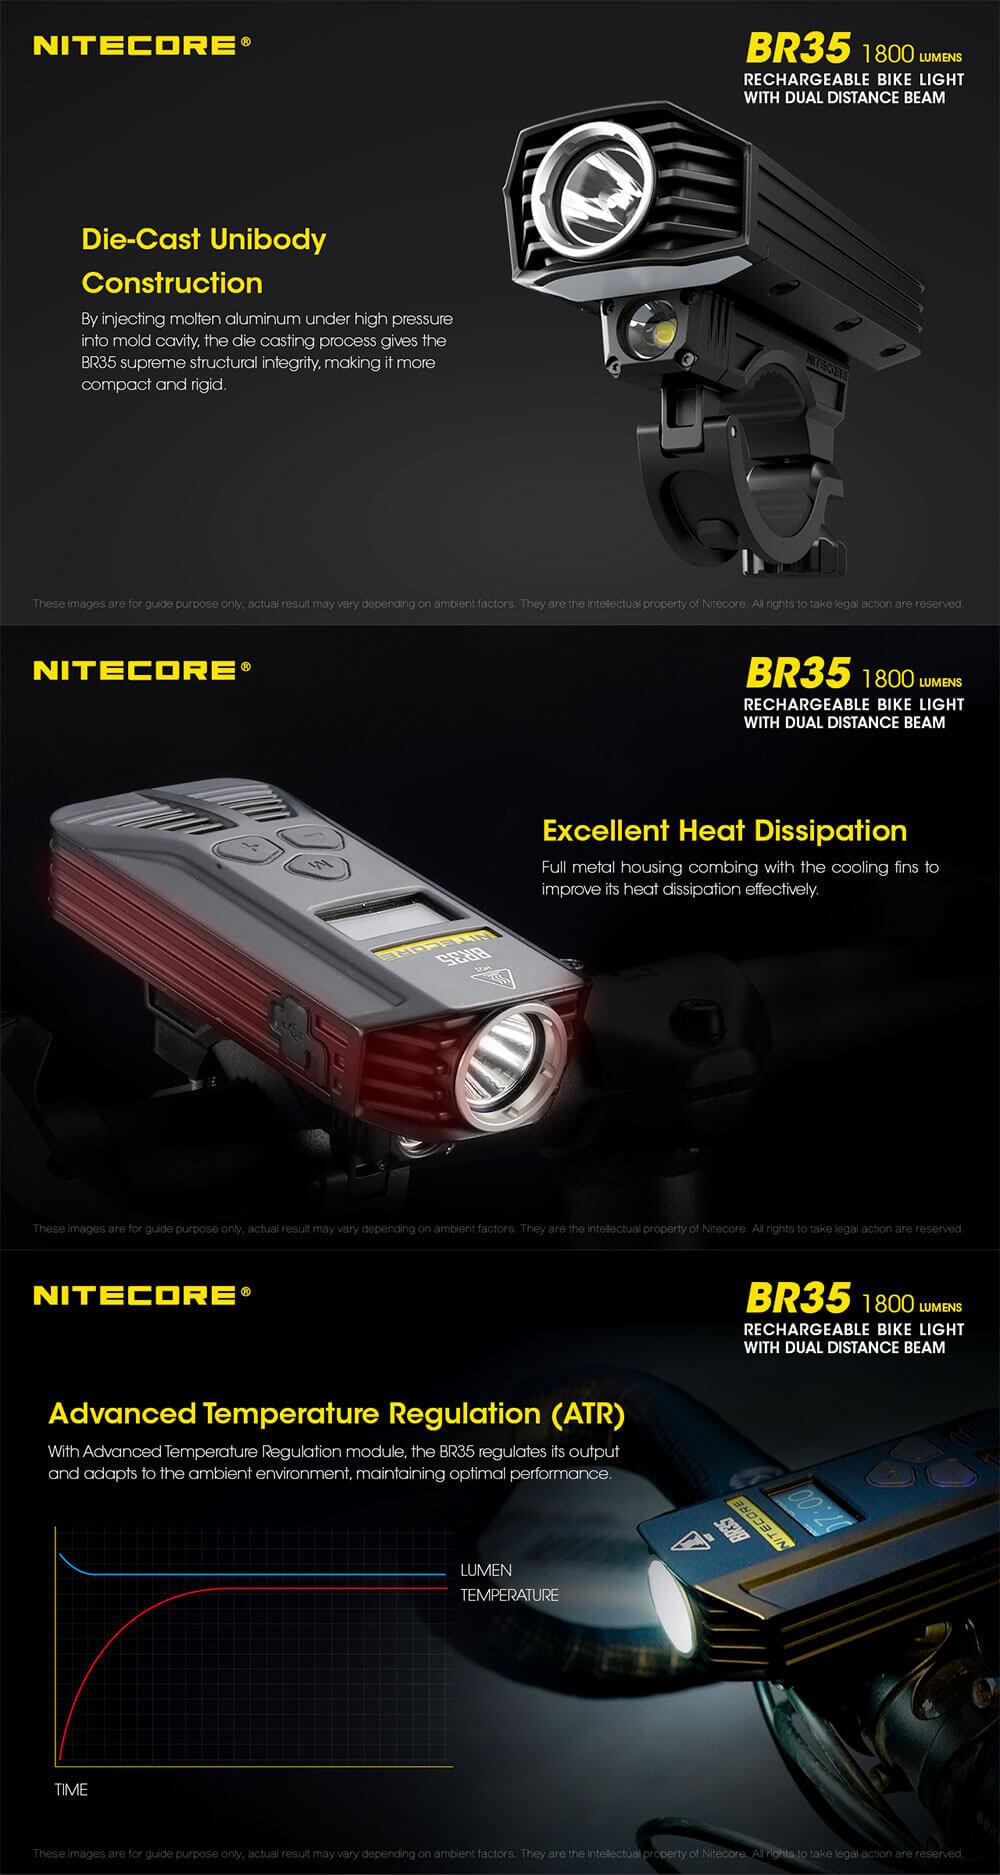 br35 1800 Lm bike light